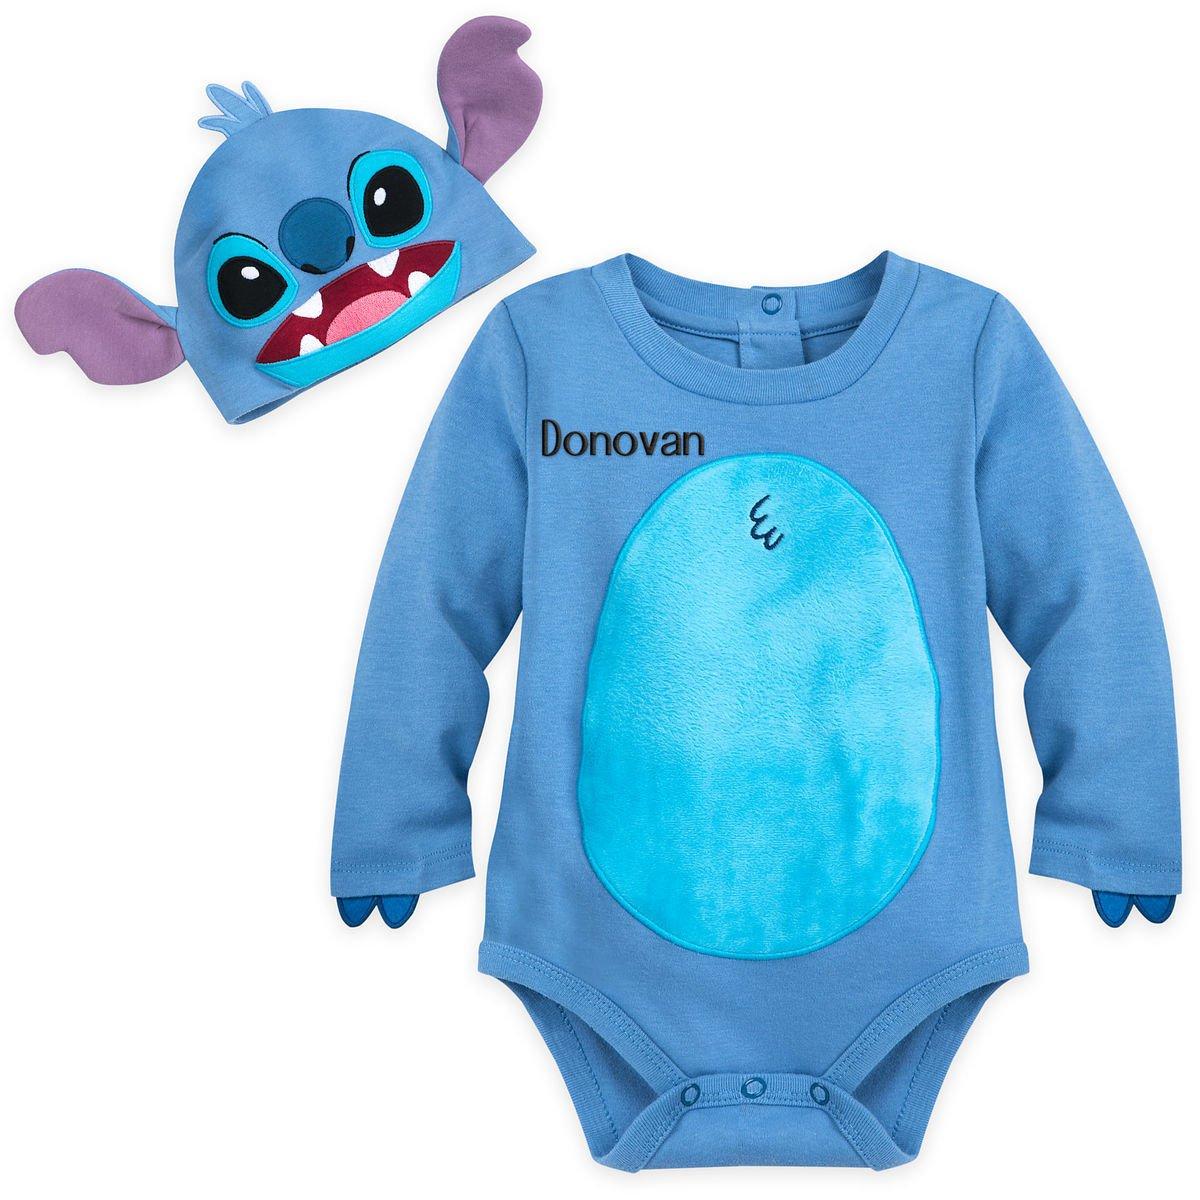 Disney Store Stitch Baby Costume Bodysuit Hat Lilo and Stitch 12-18 Months 2018 New